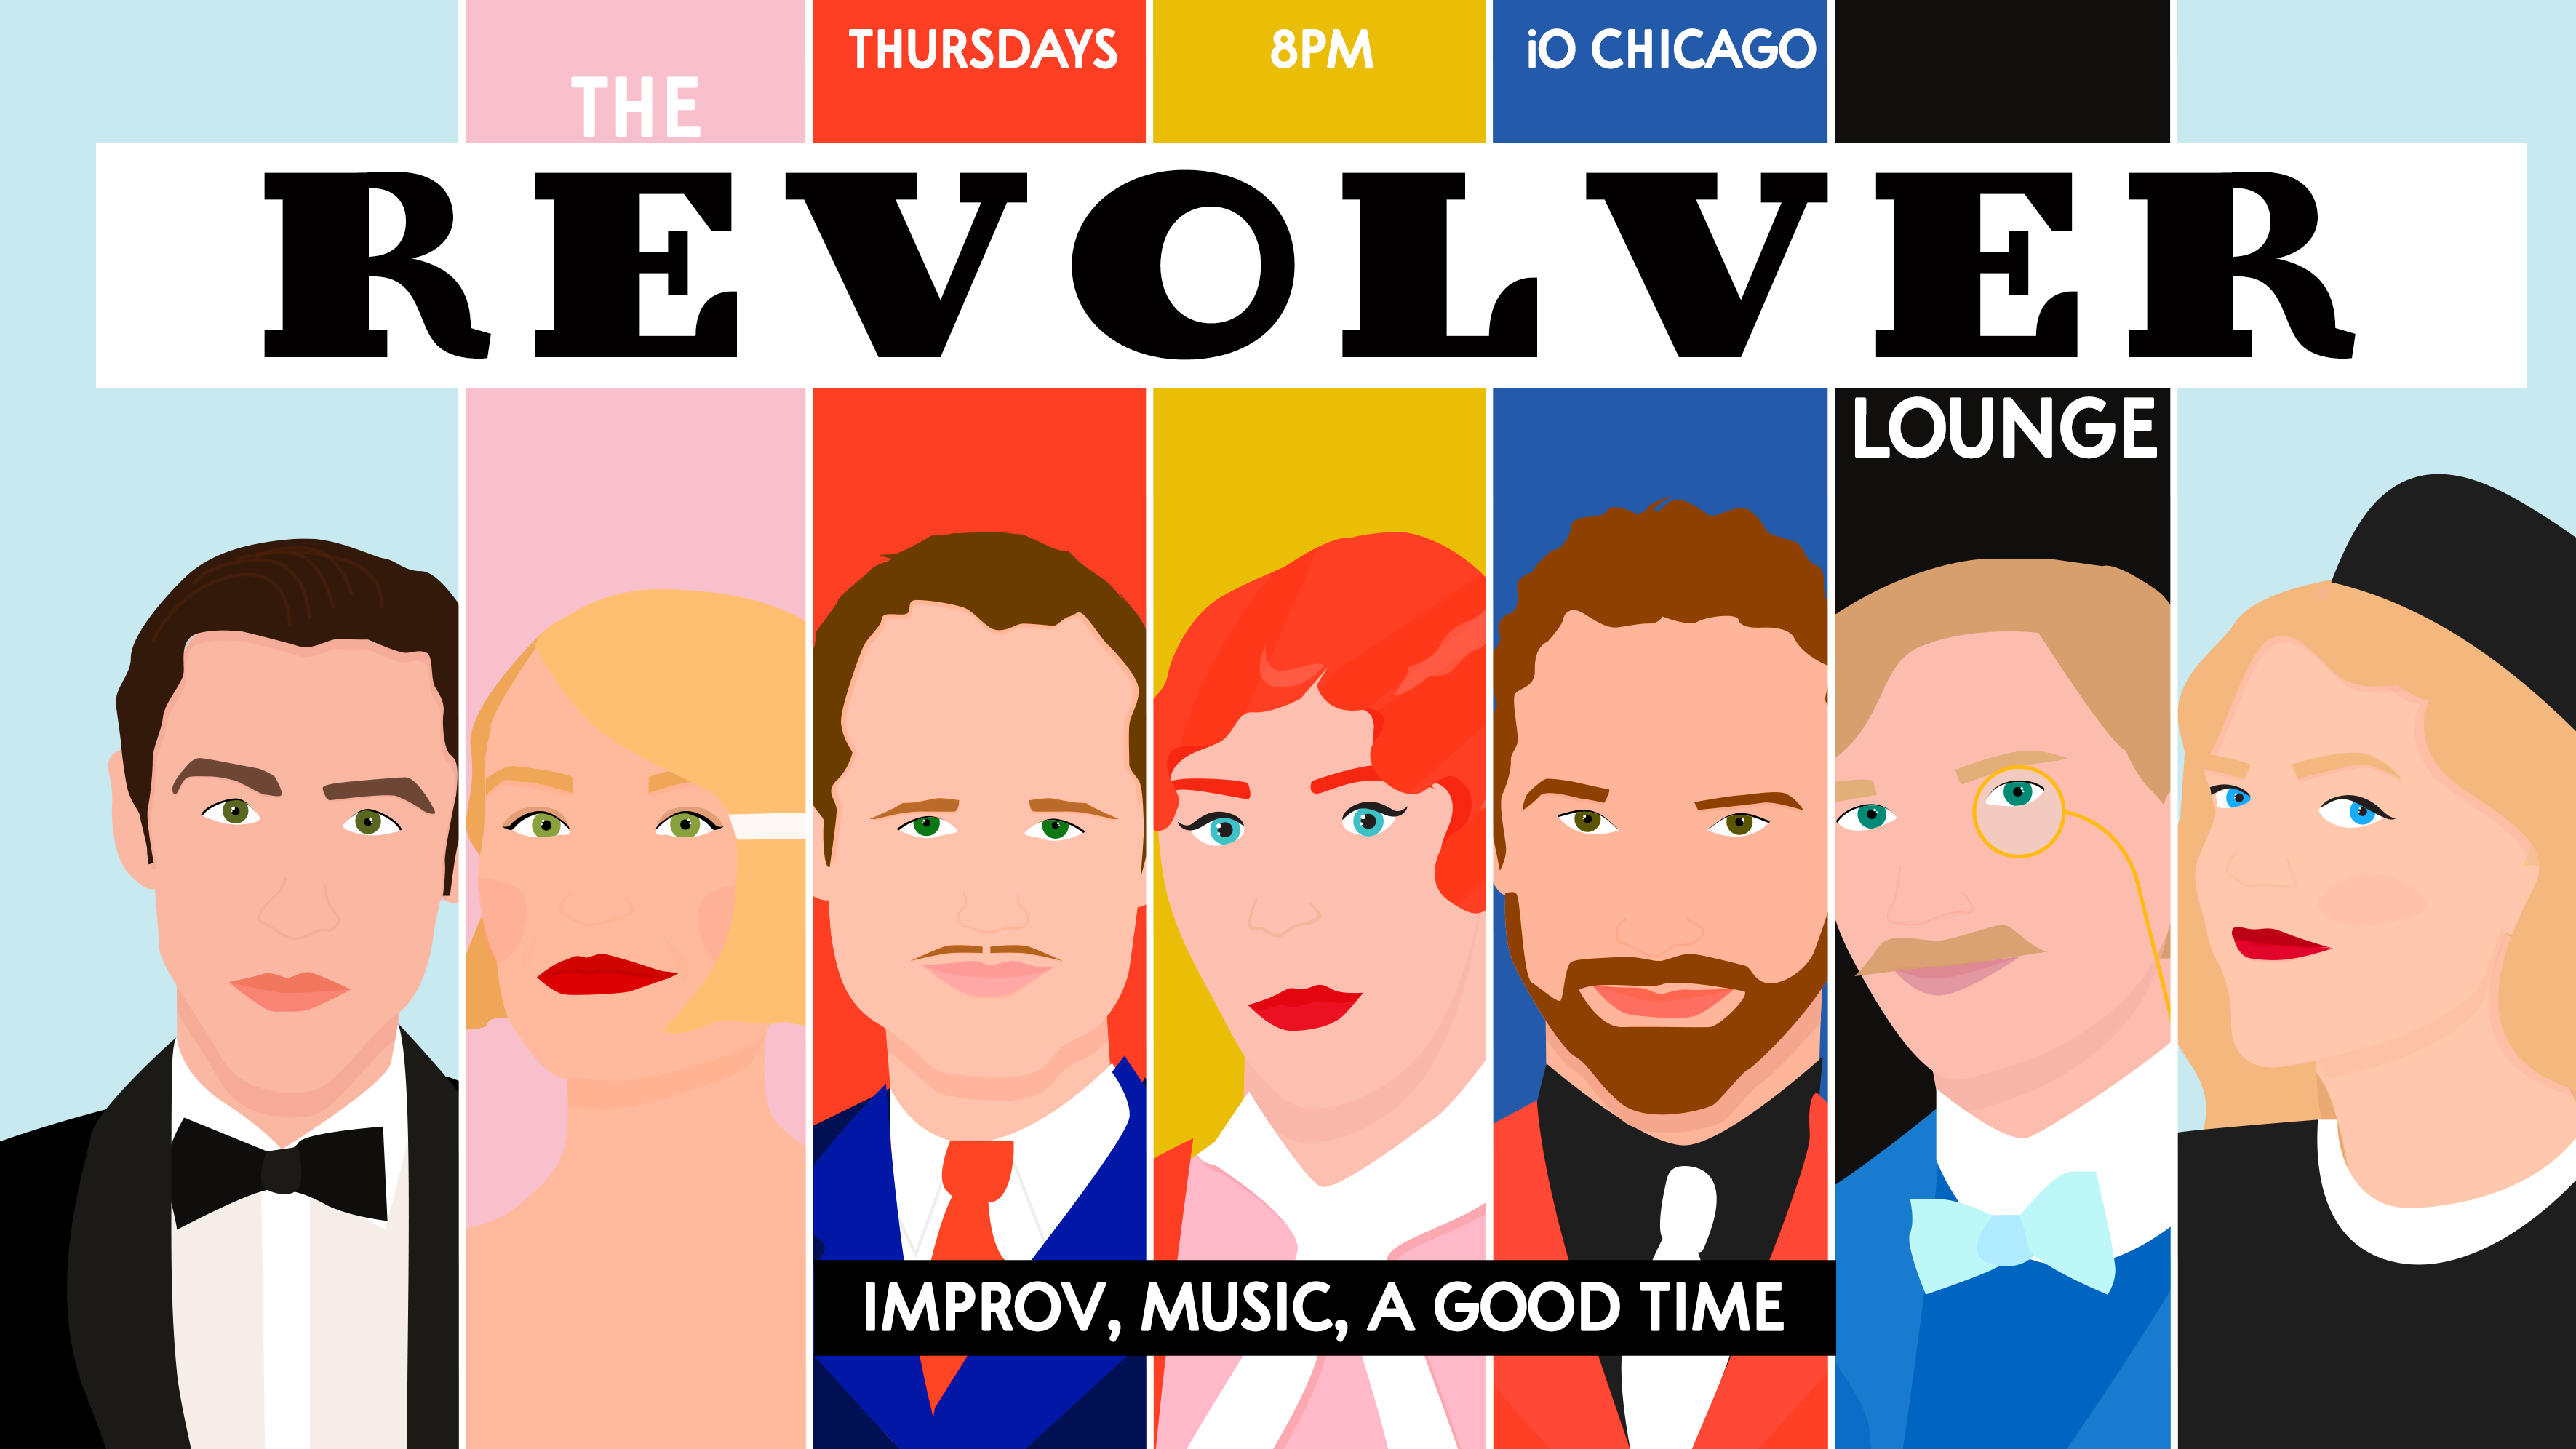 The Revolver Lounge